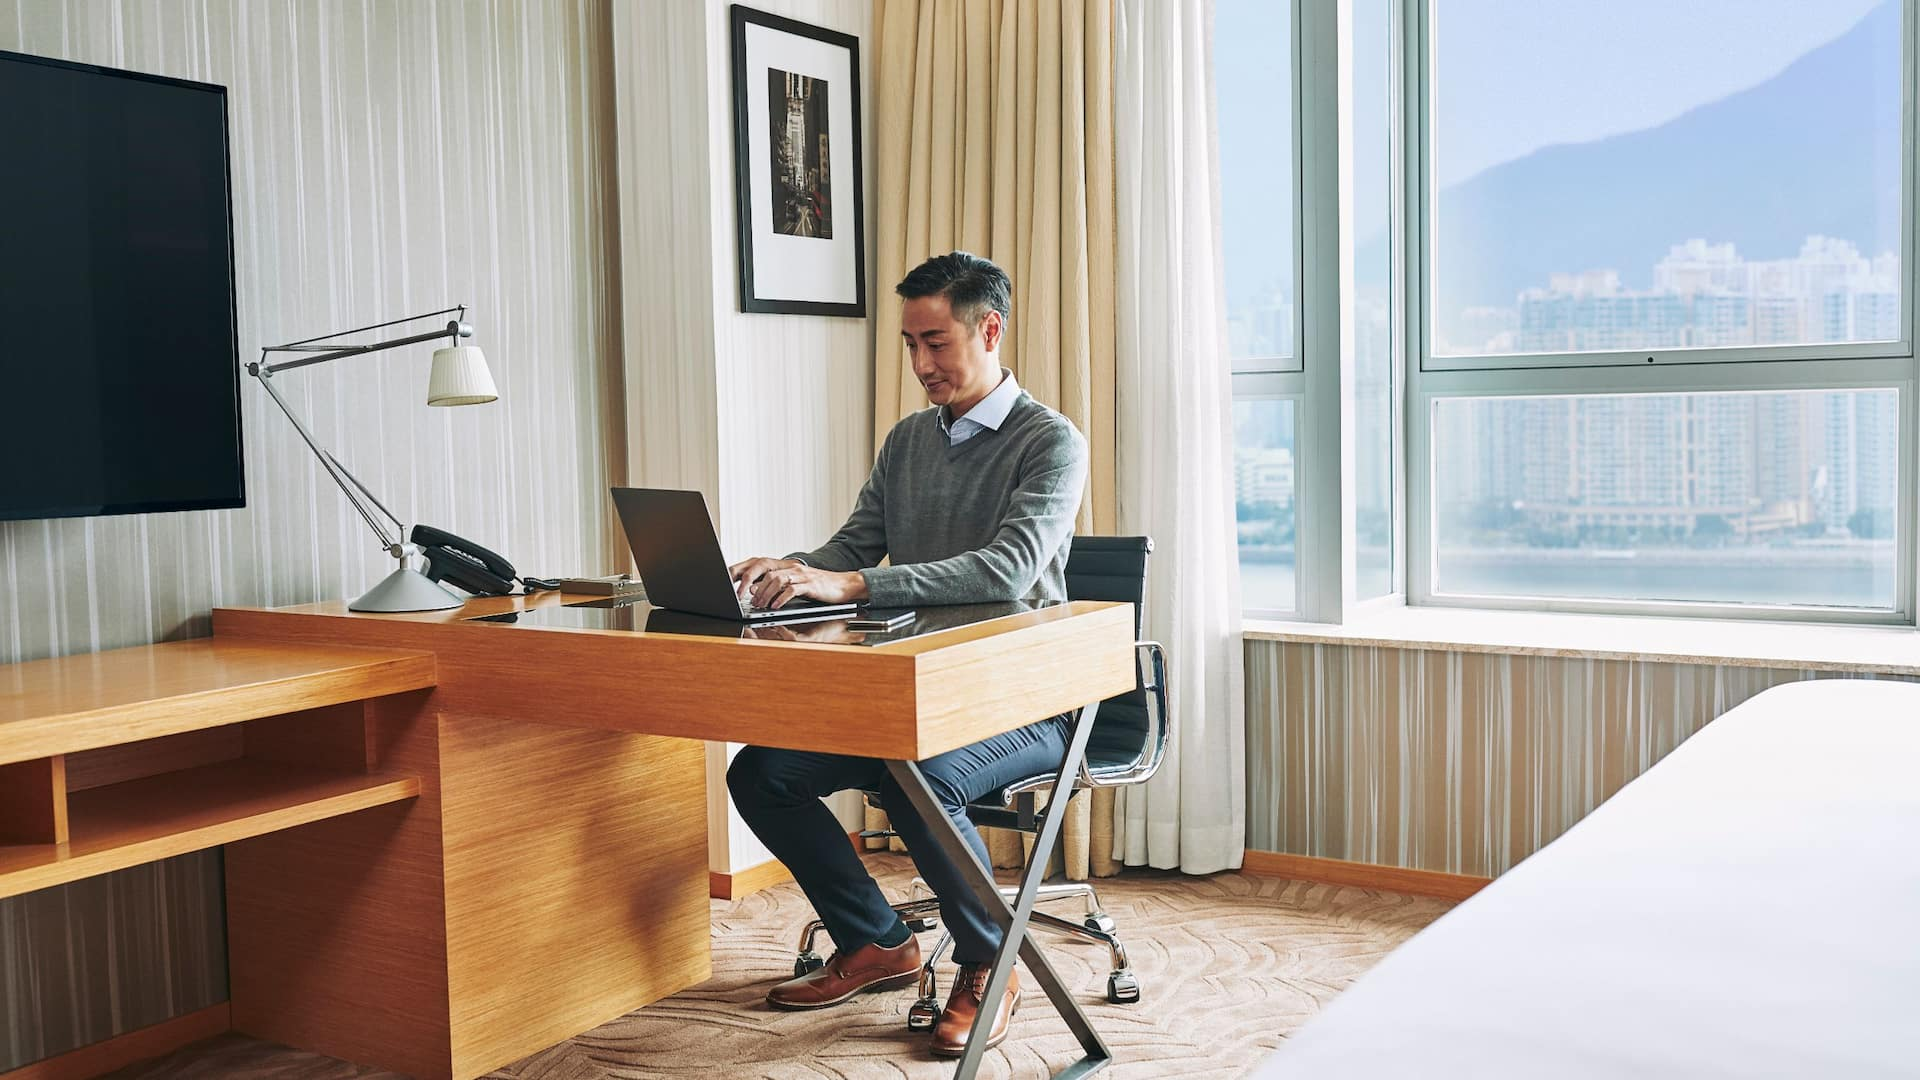 WOH_P260_Business_Traveler_Man_Working_Laptop_Desk